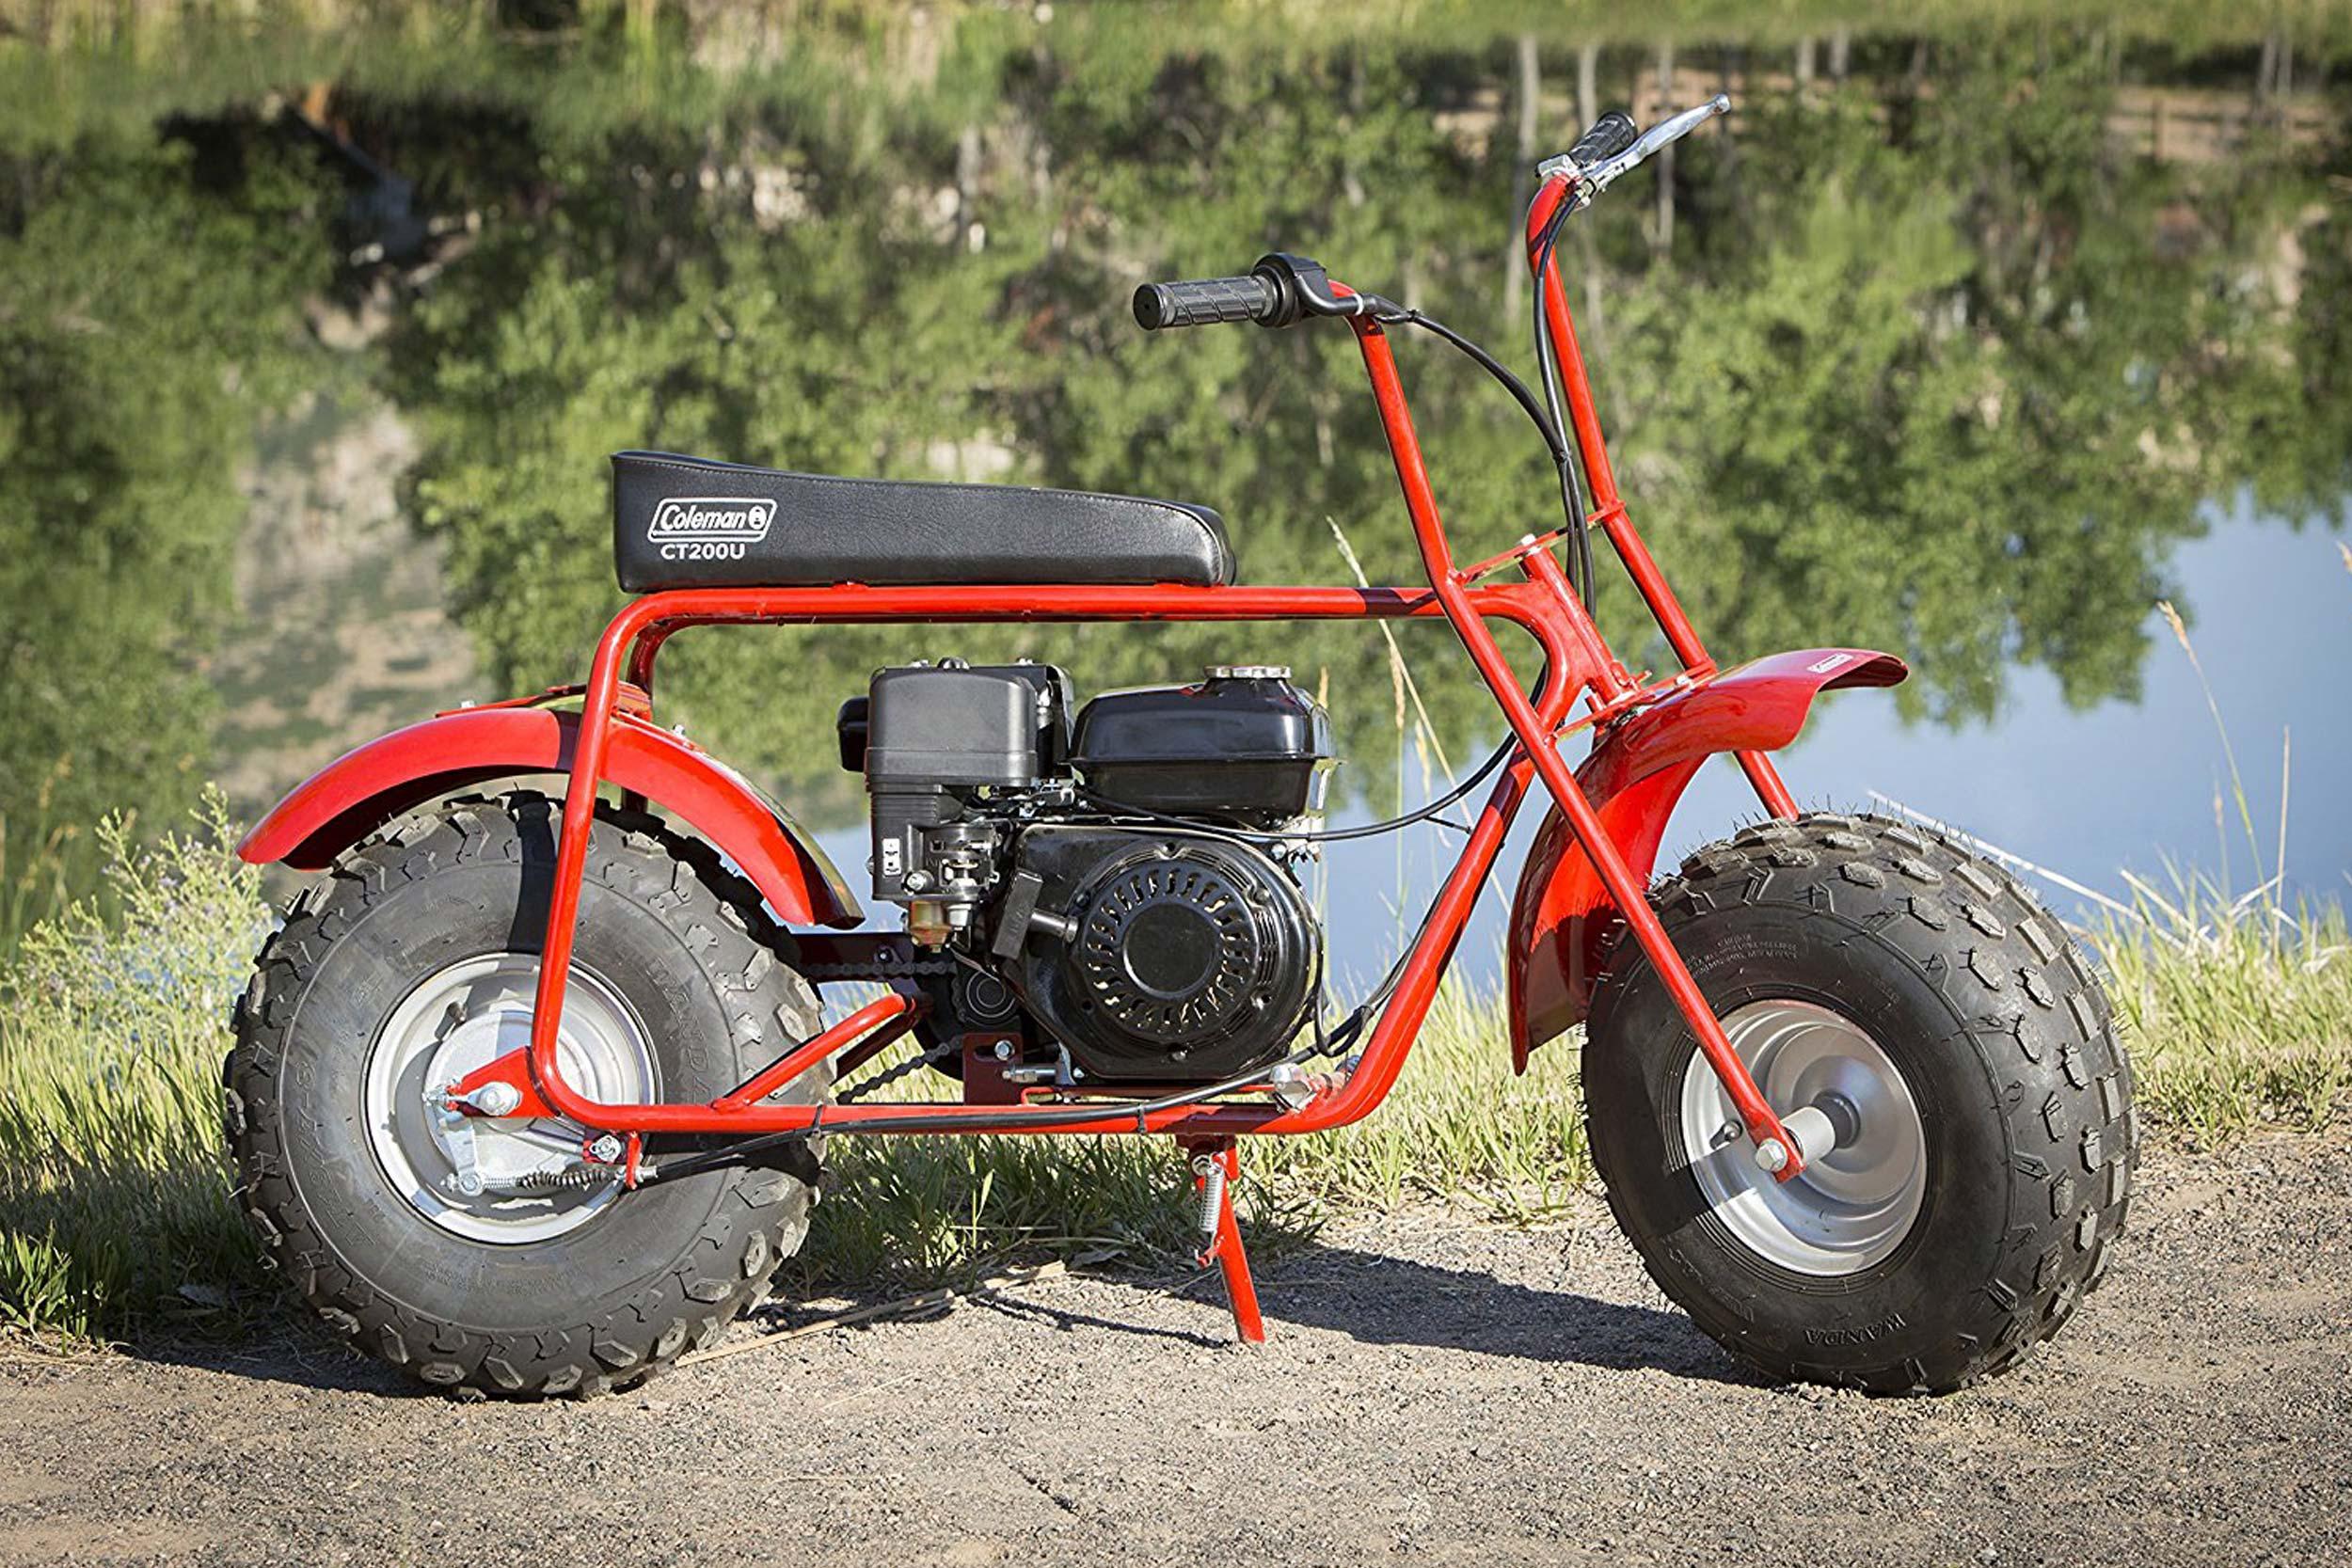 Coleman Minibike